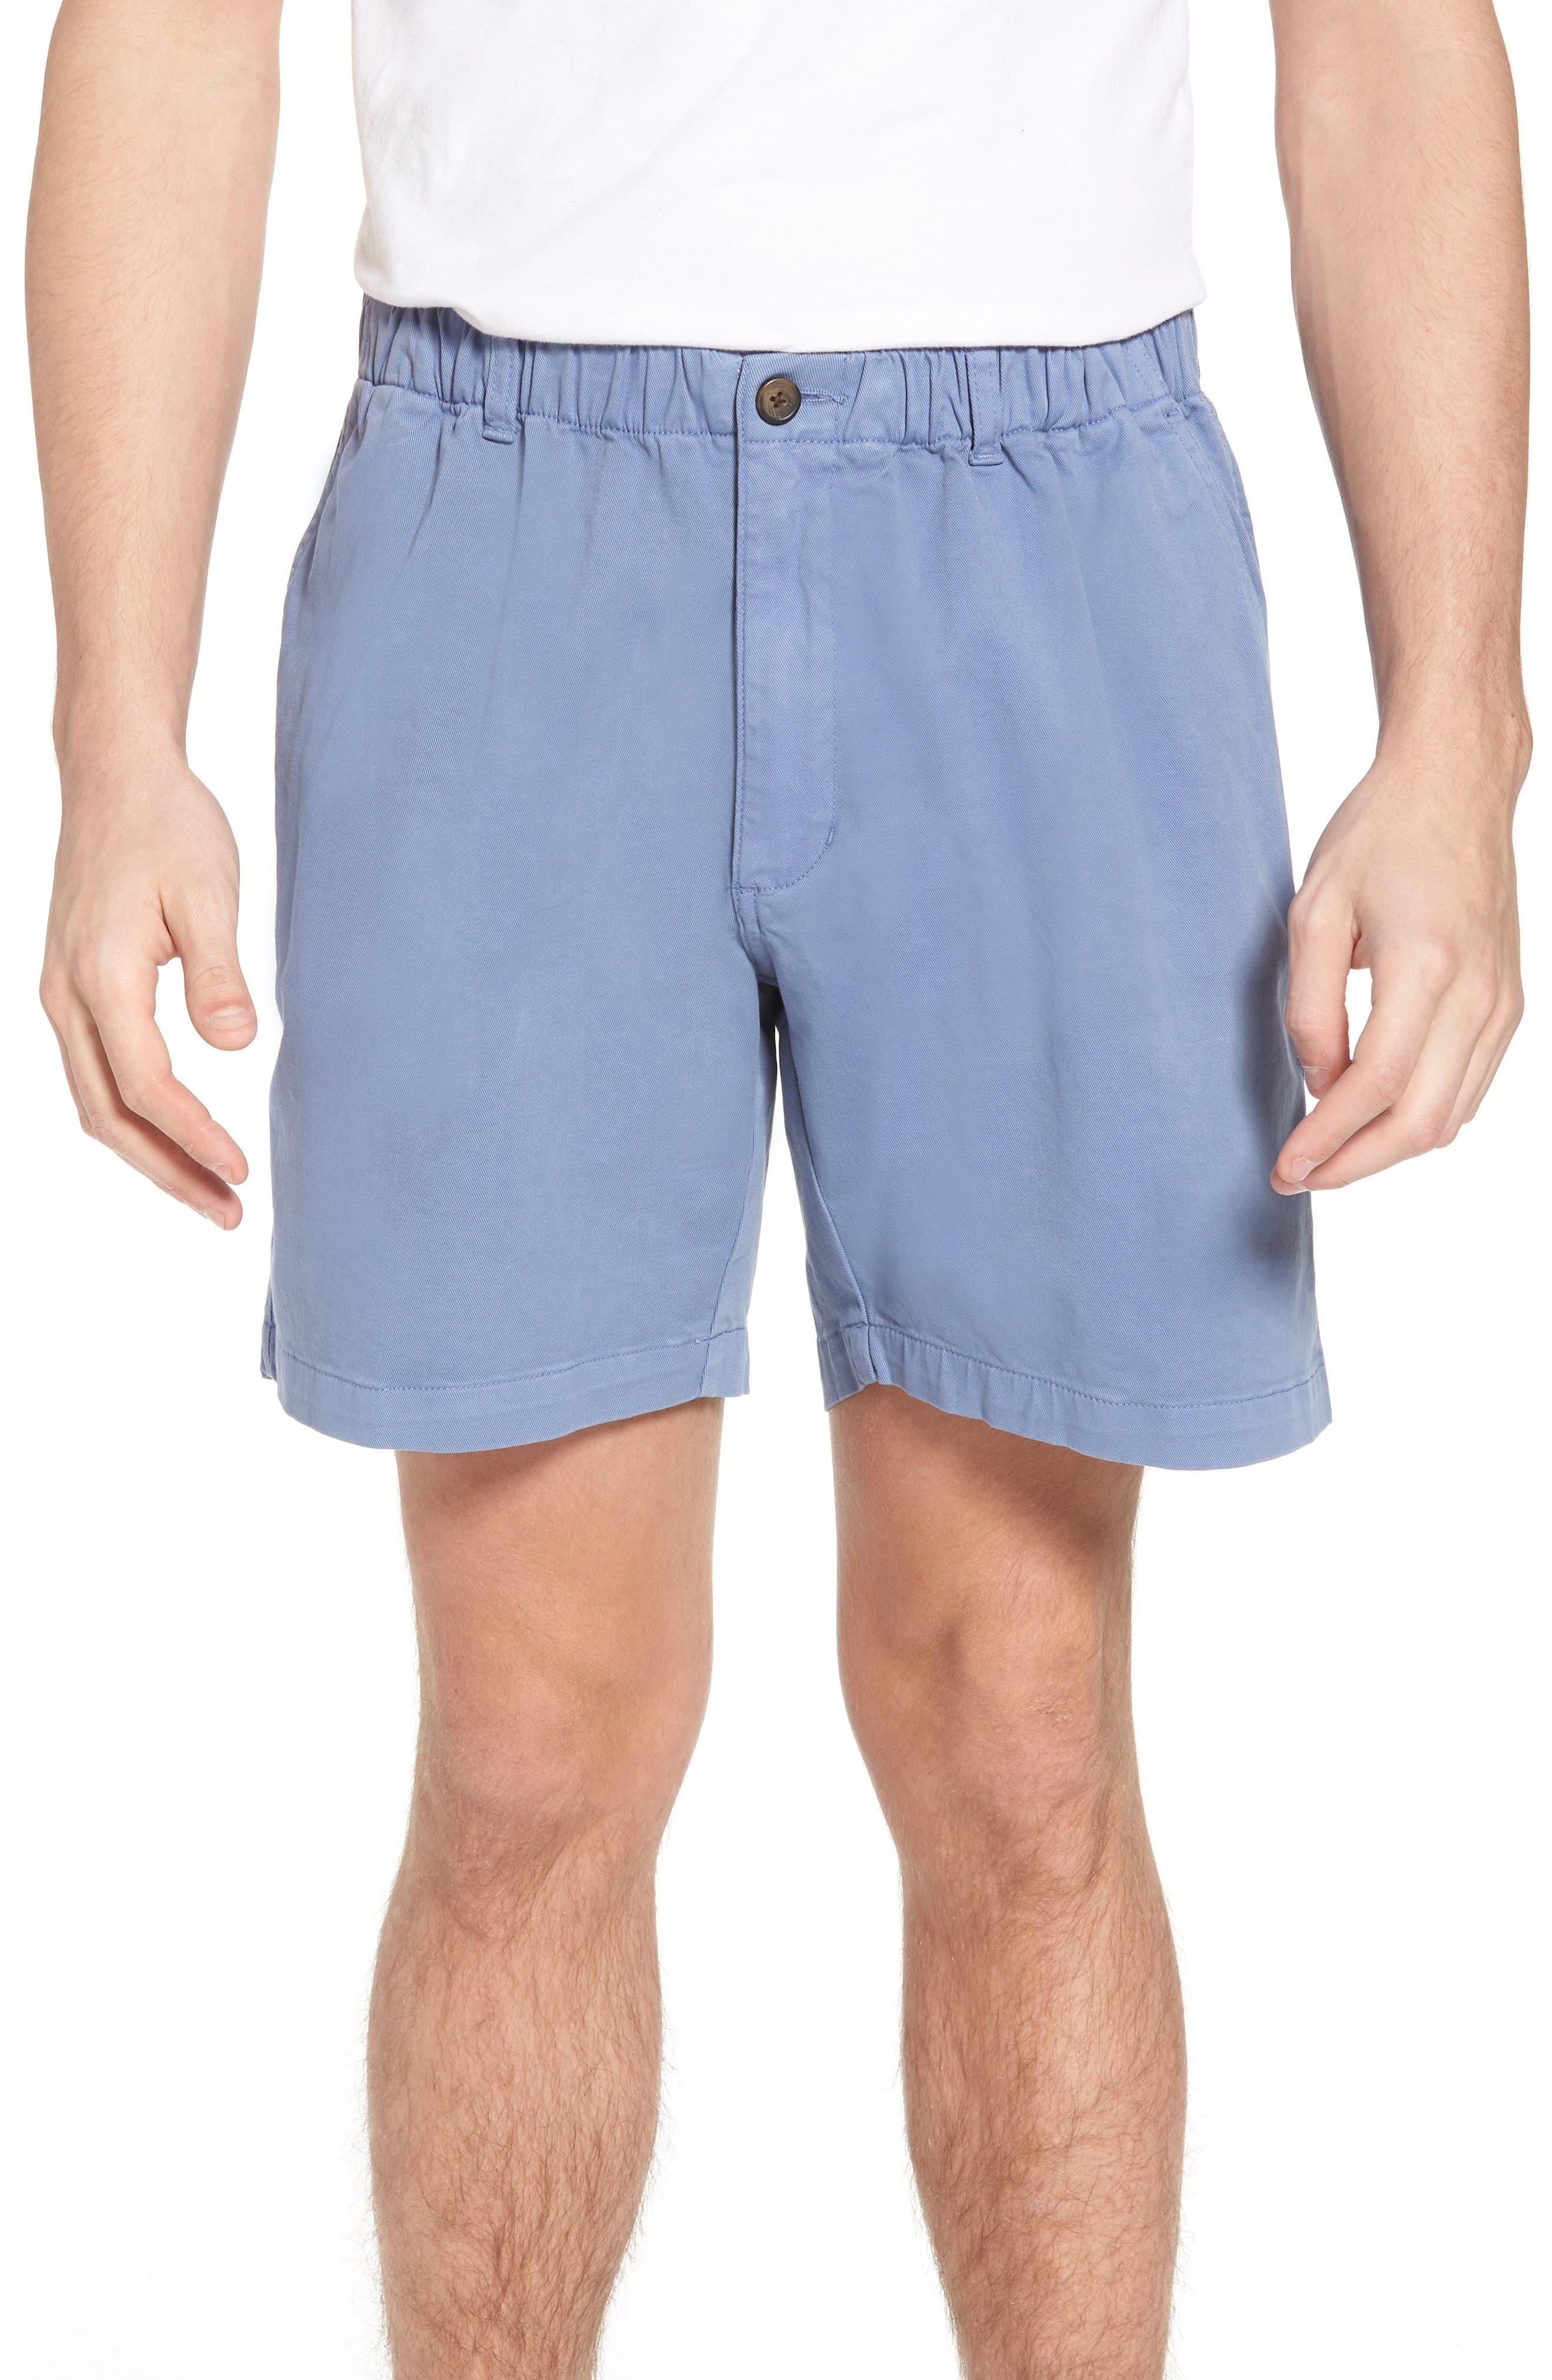 Main Image - Vintage 1946 Snappers Elastic Waist Shorts